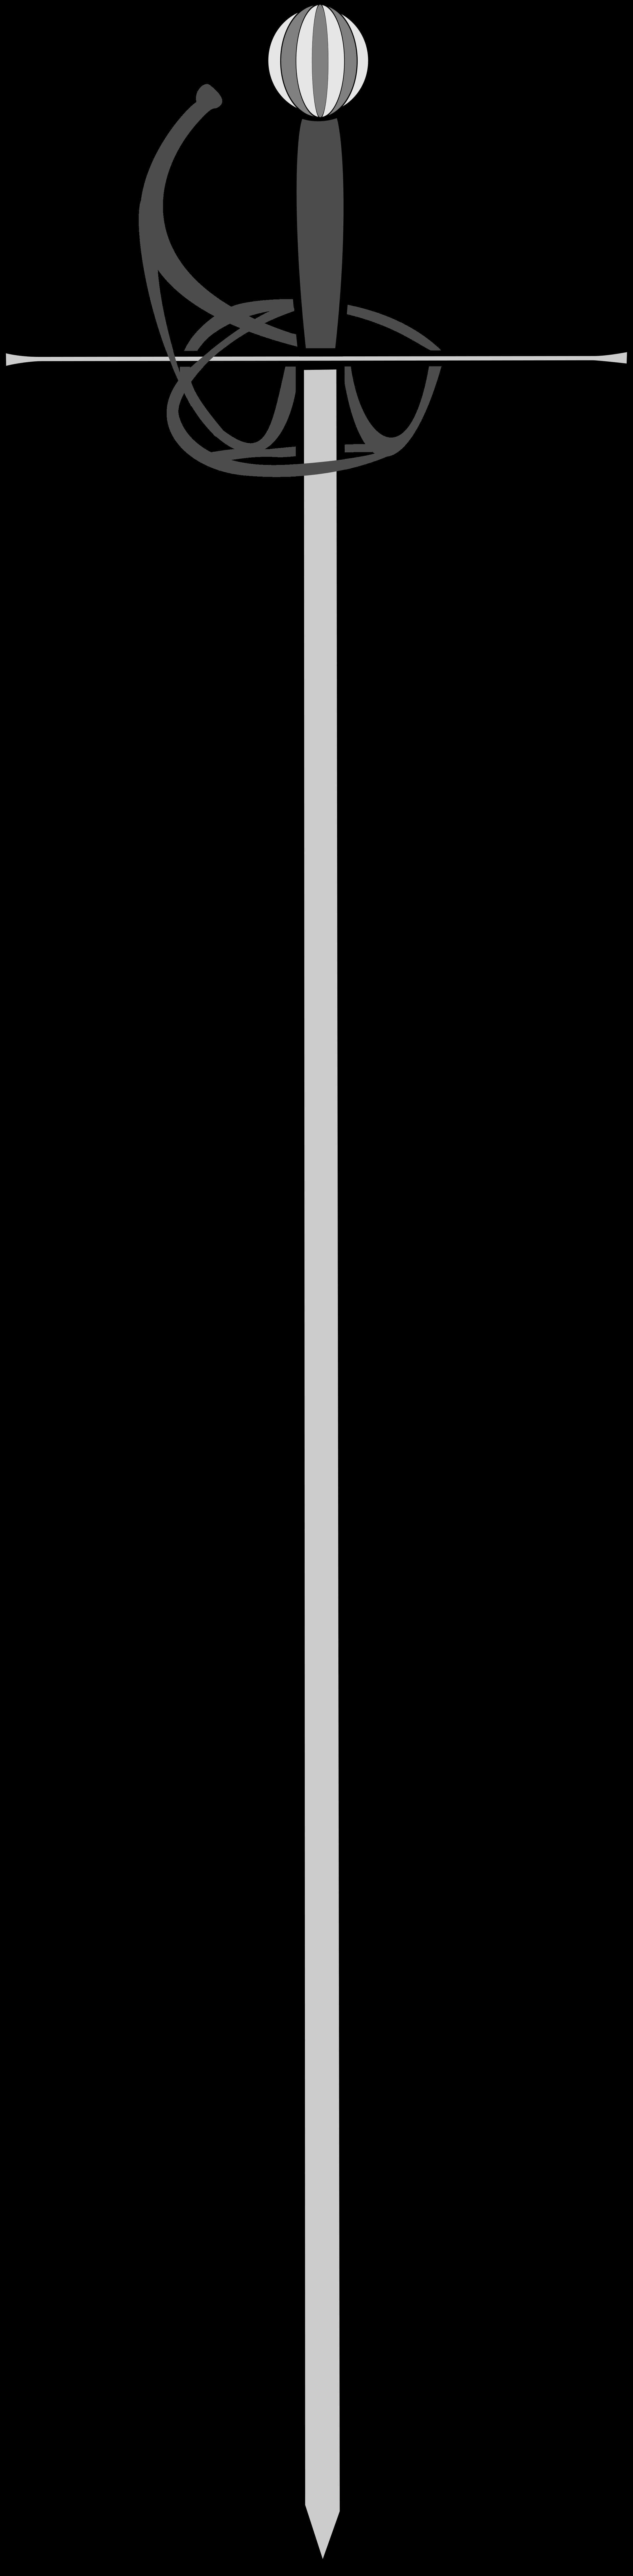 Clipart sword rapier. Big image png